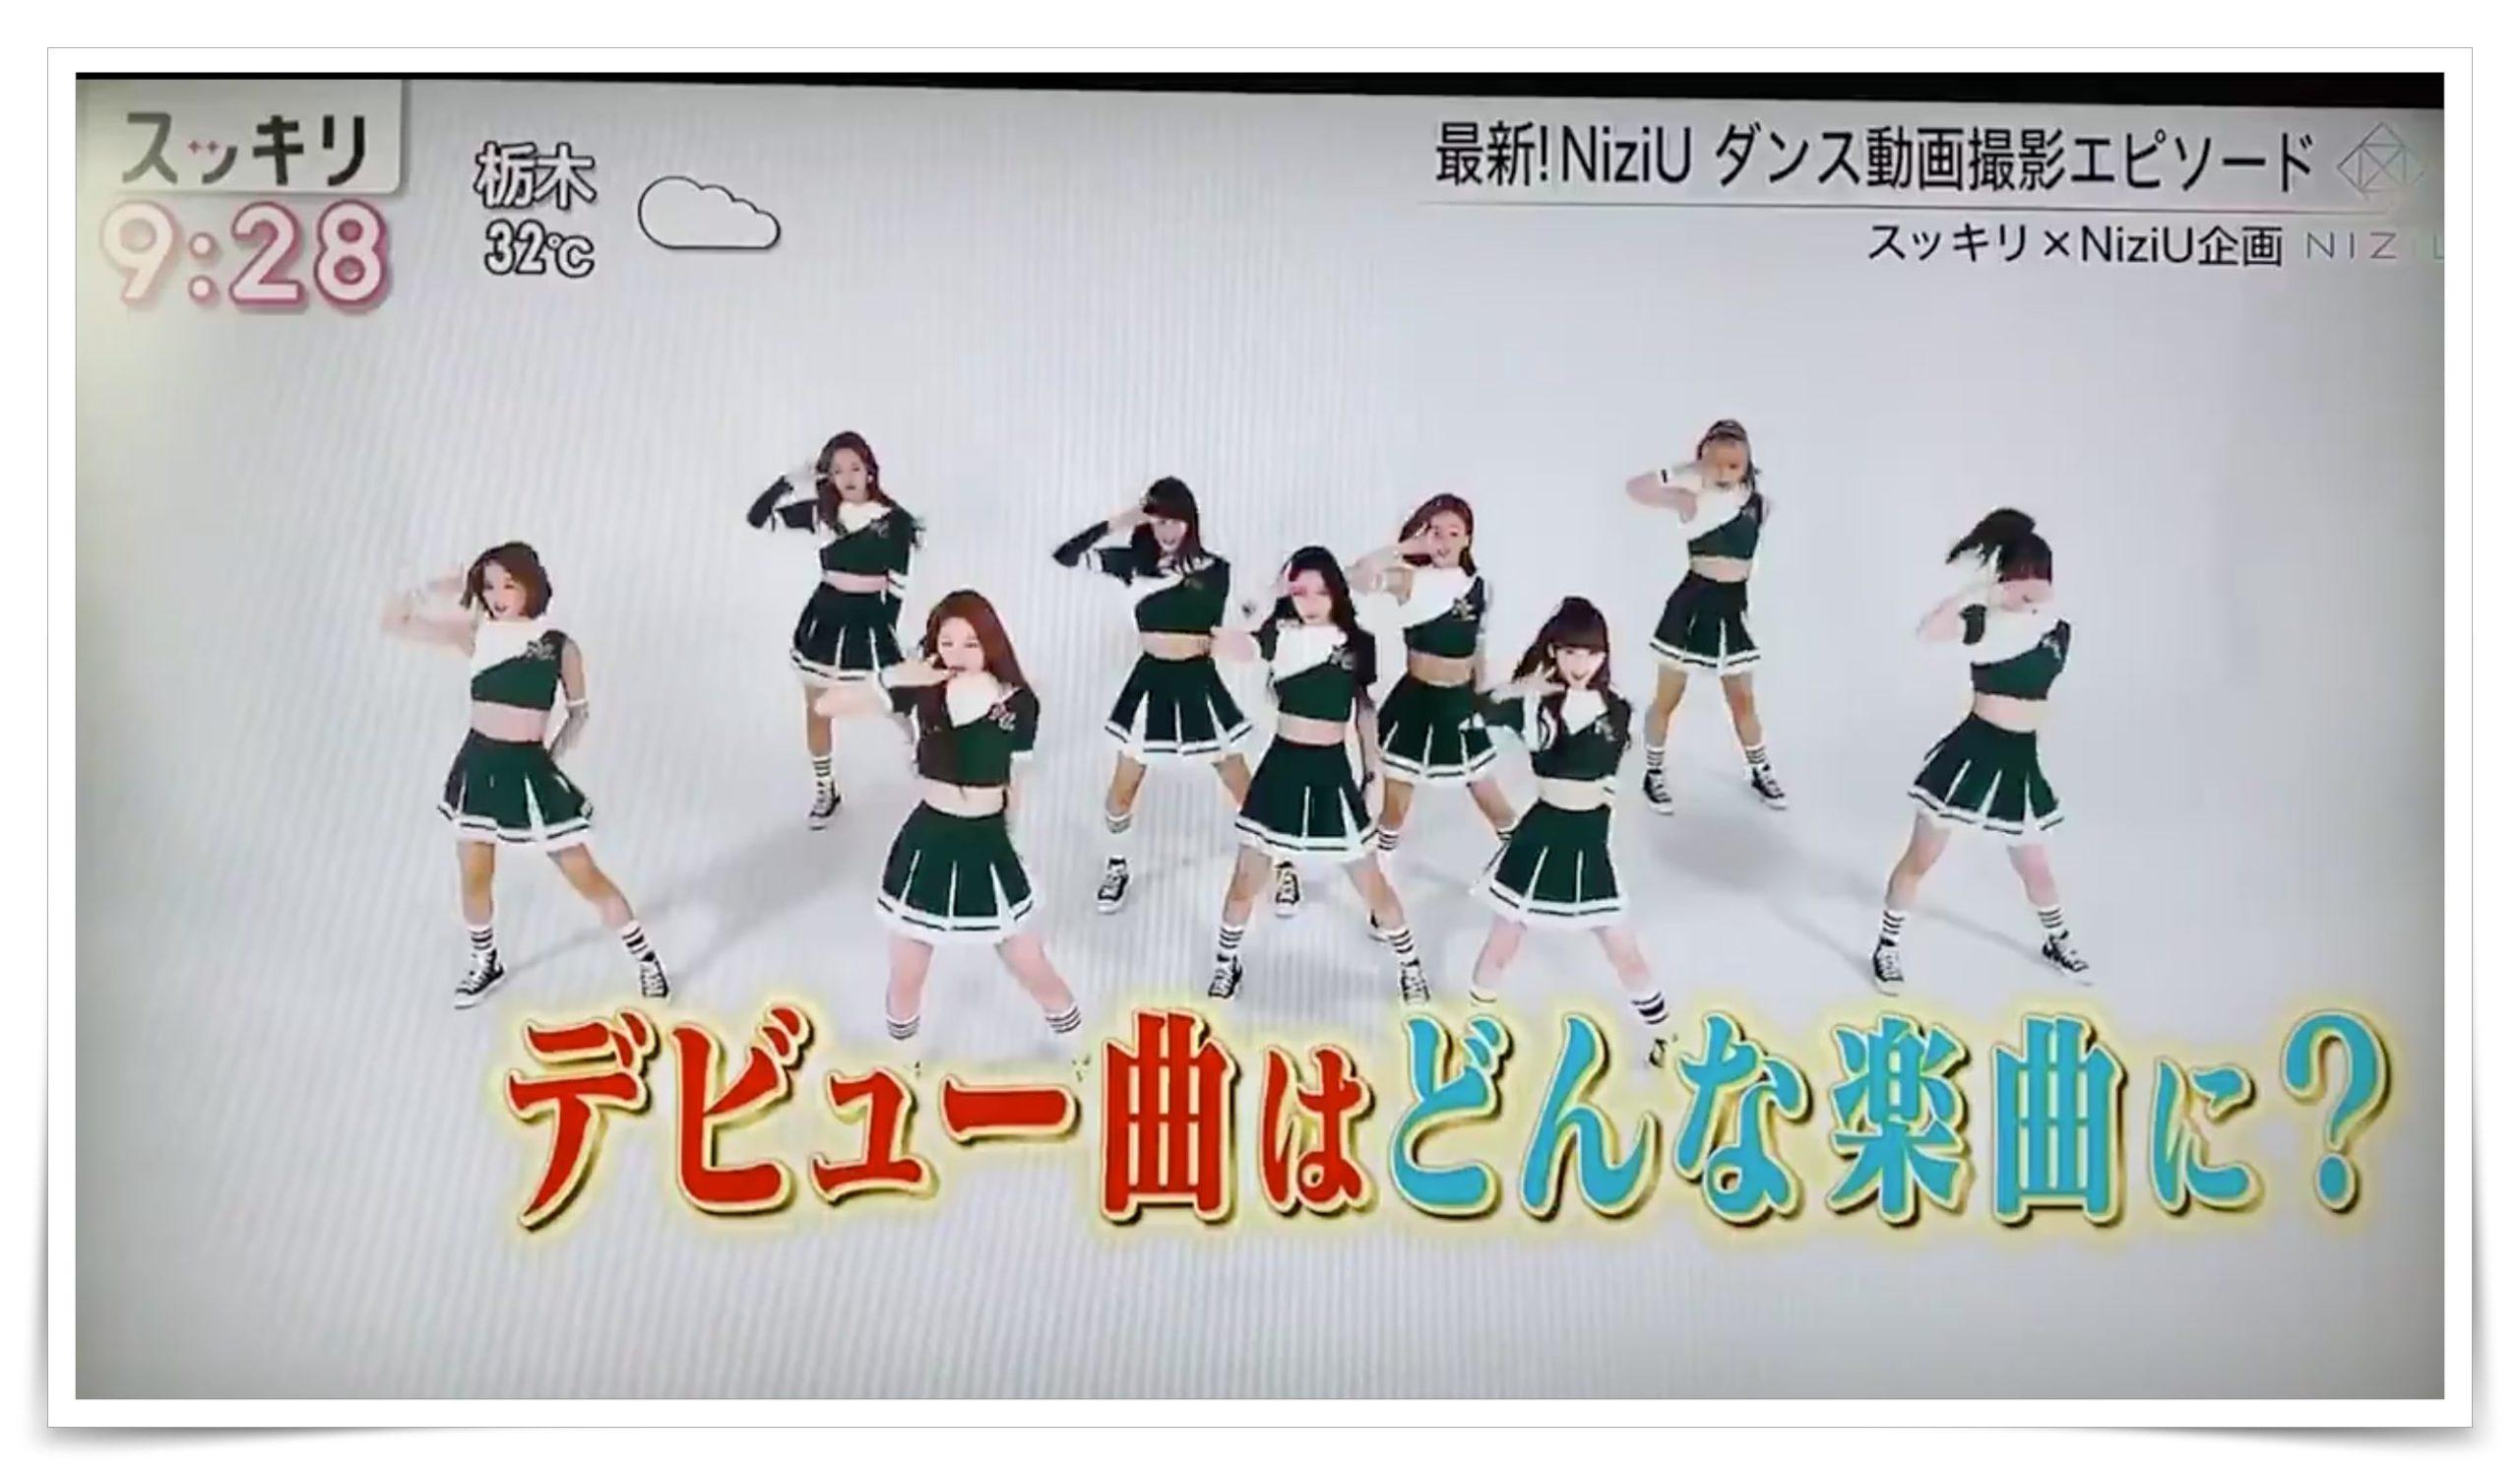 NiziU二ジューの正式デビュー日とデビュー曲画像